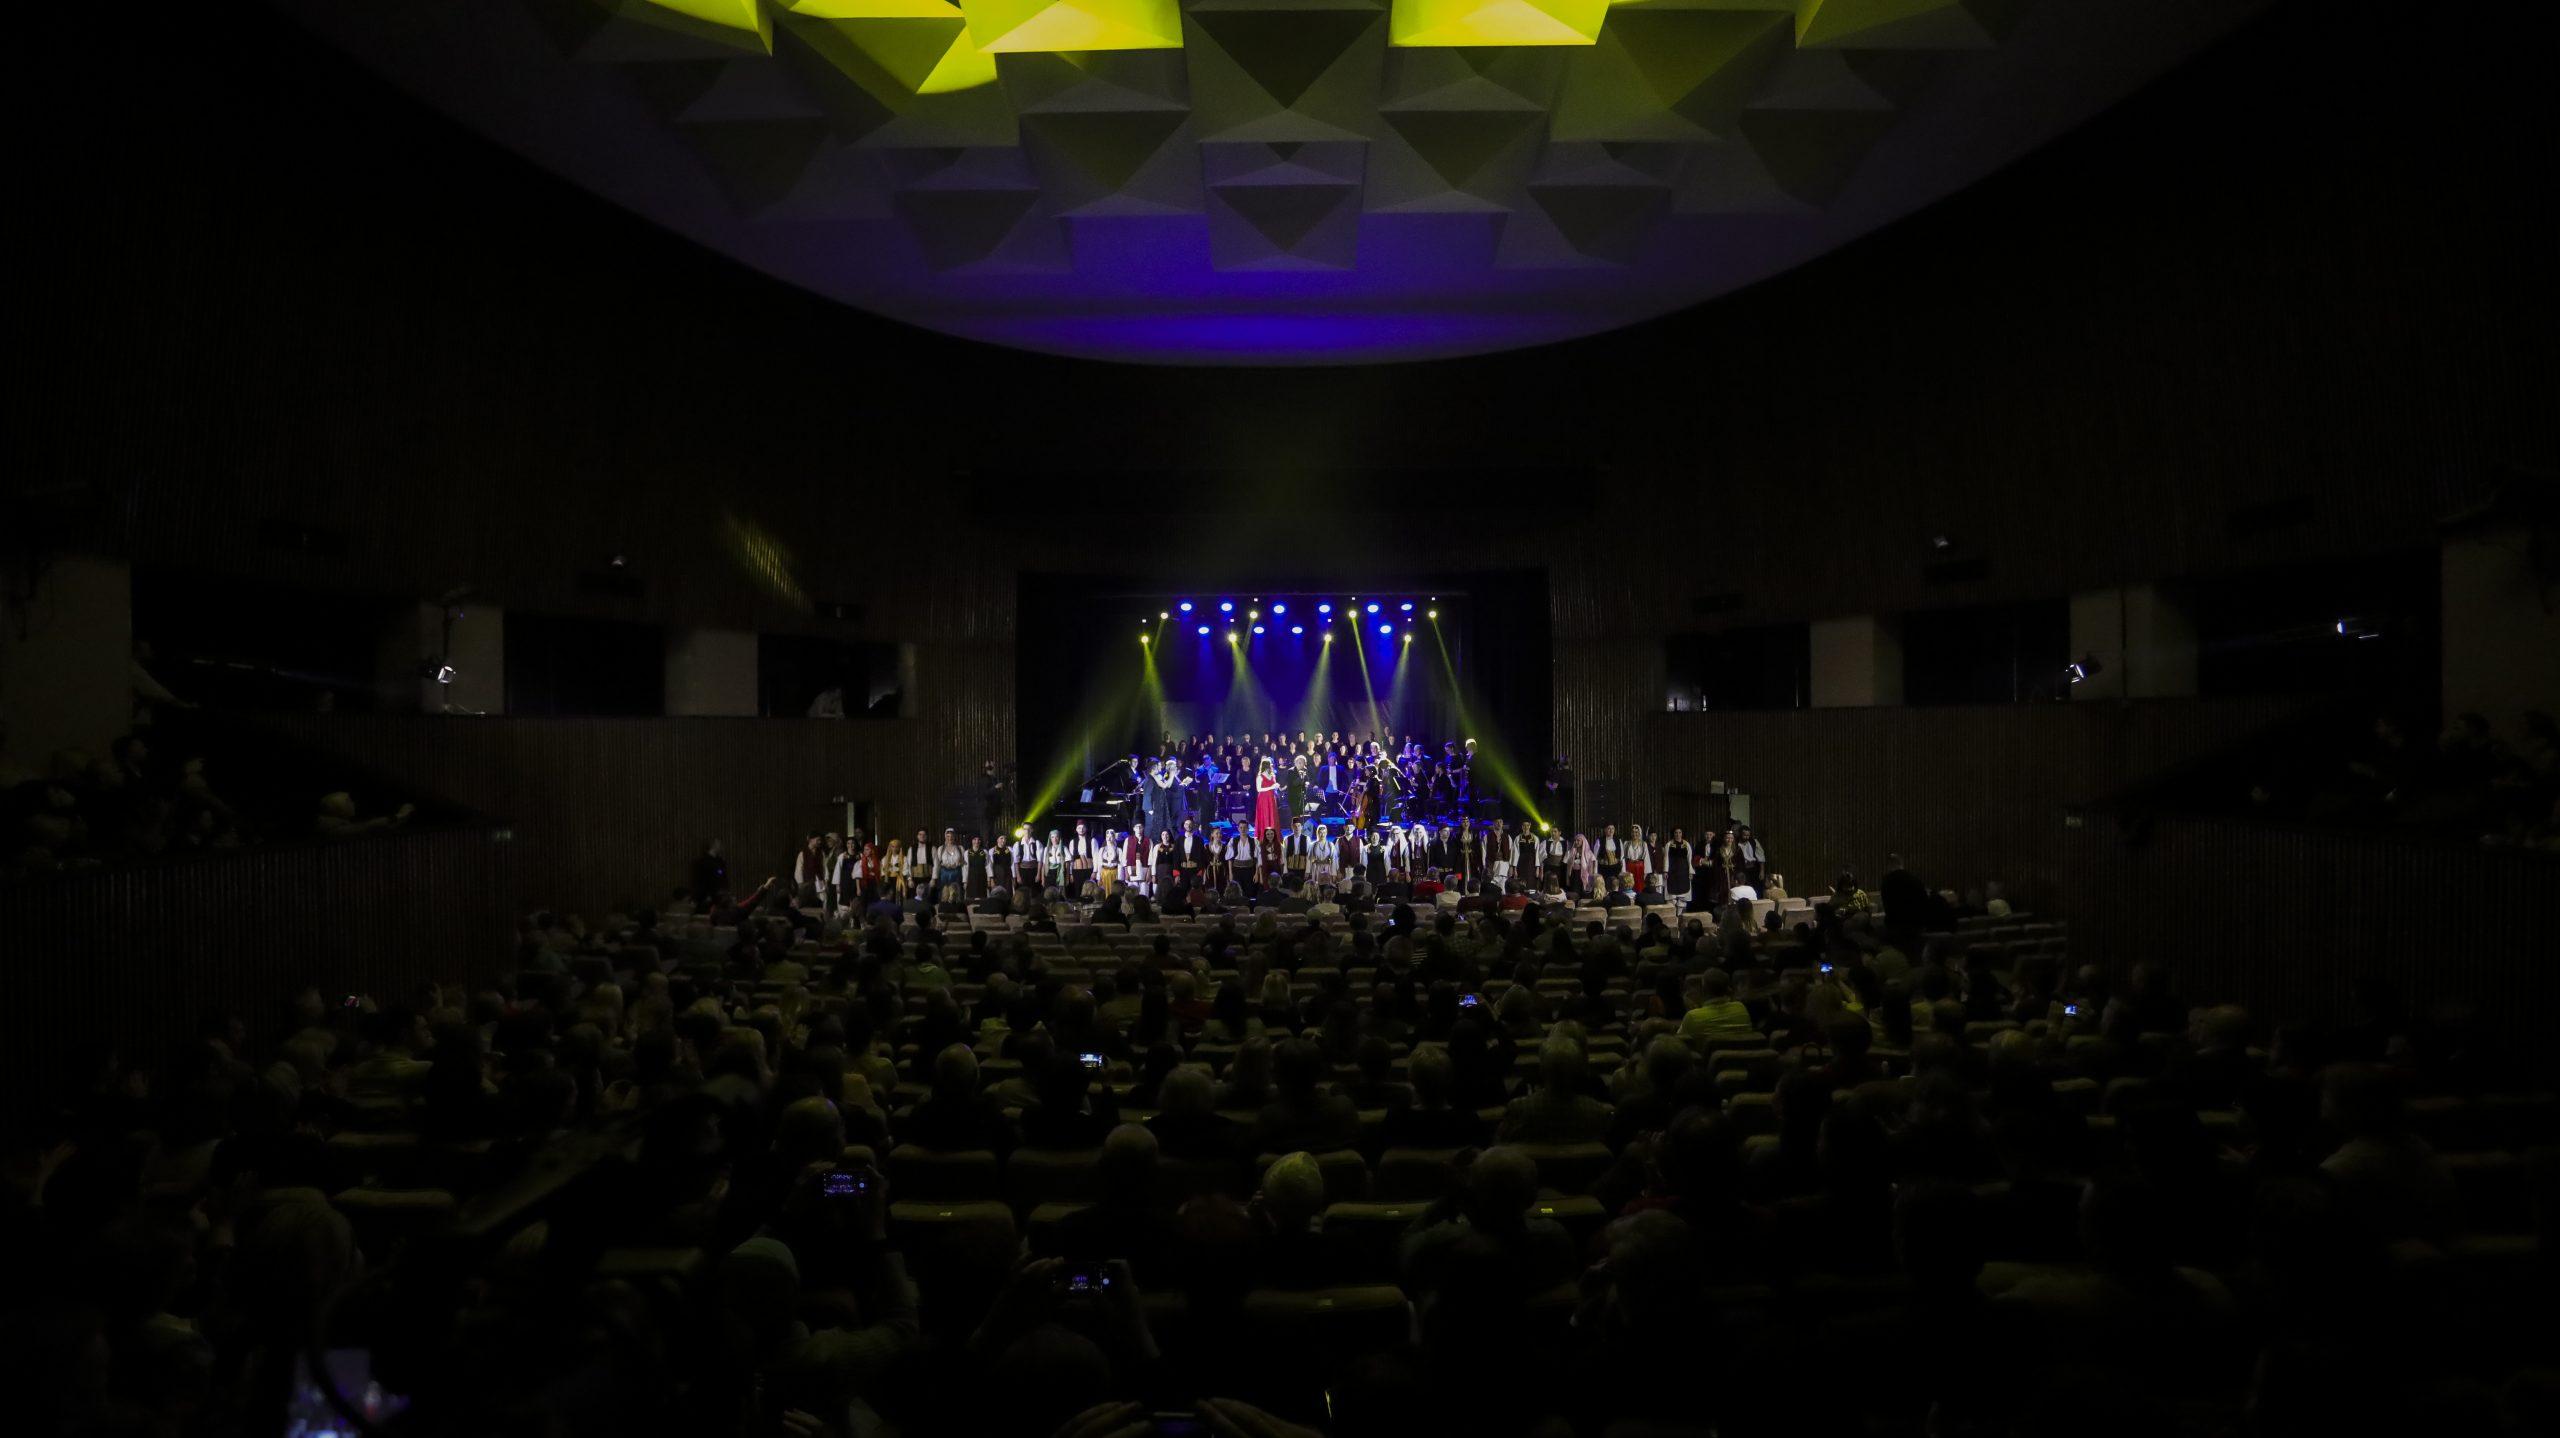 "Premijerno prikazivanje snimka koncerta pod nazivom ""Sevdah orient express – polazna stanica BKC"" 15. 05. 2021."